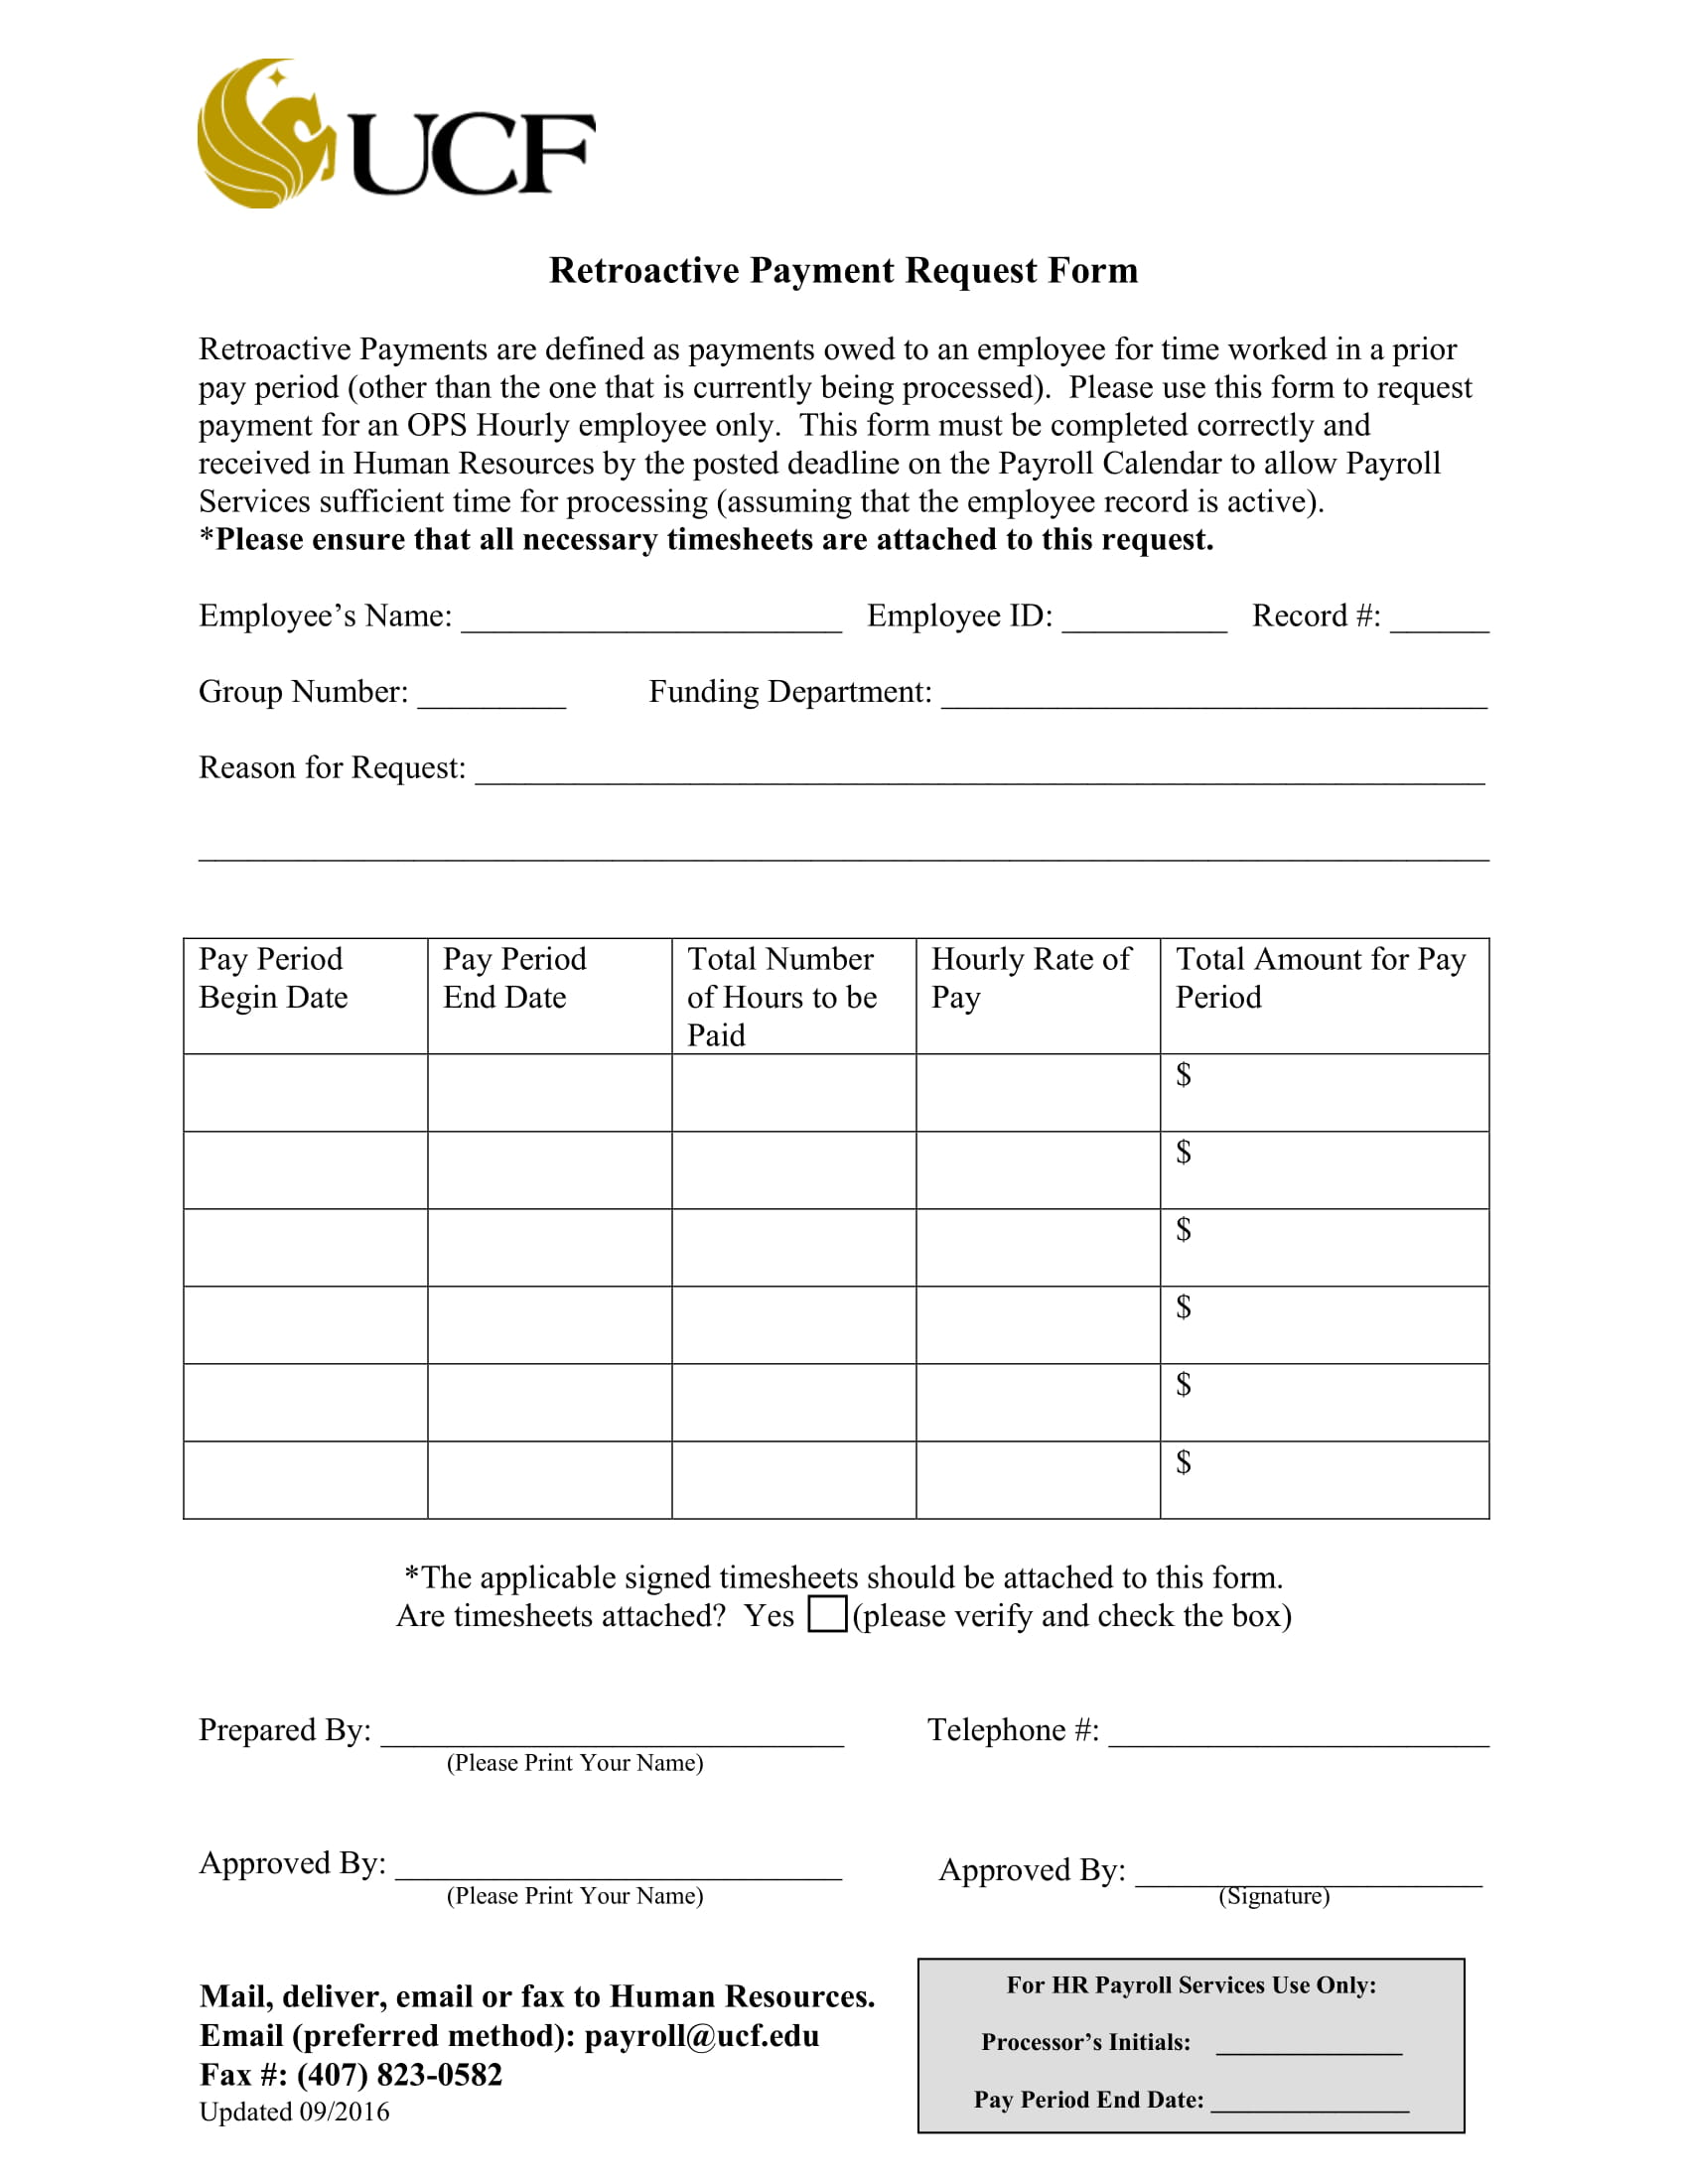 retroactive payment request form 1